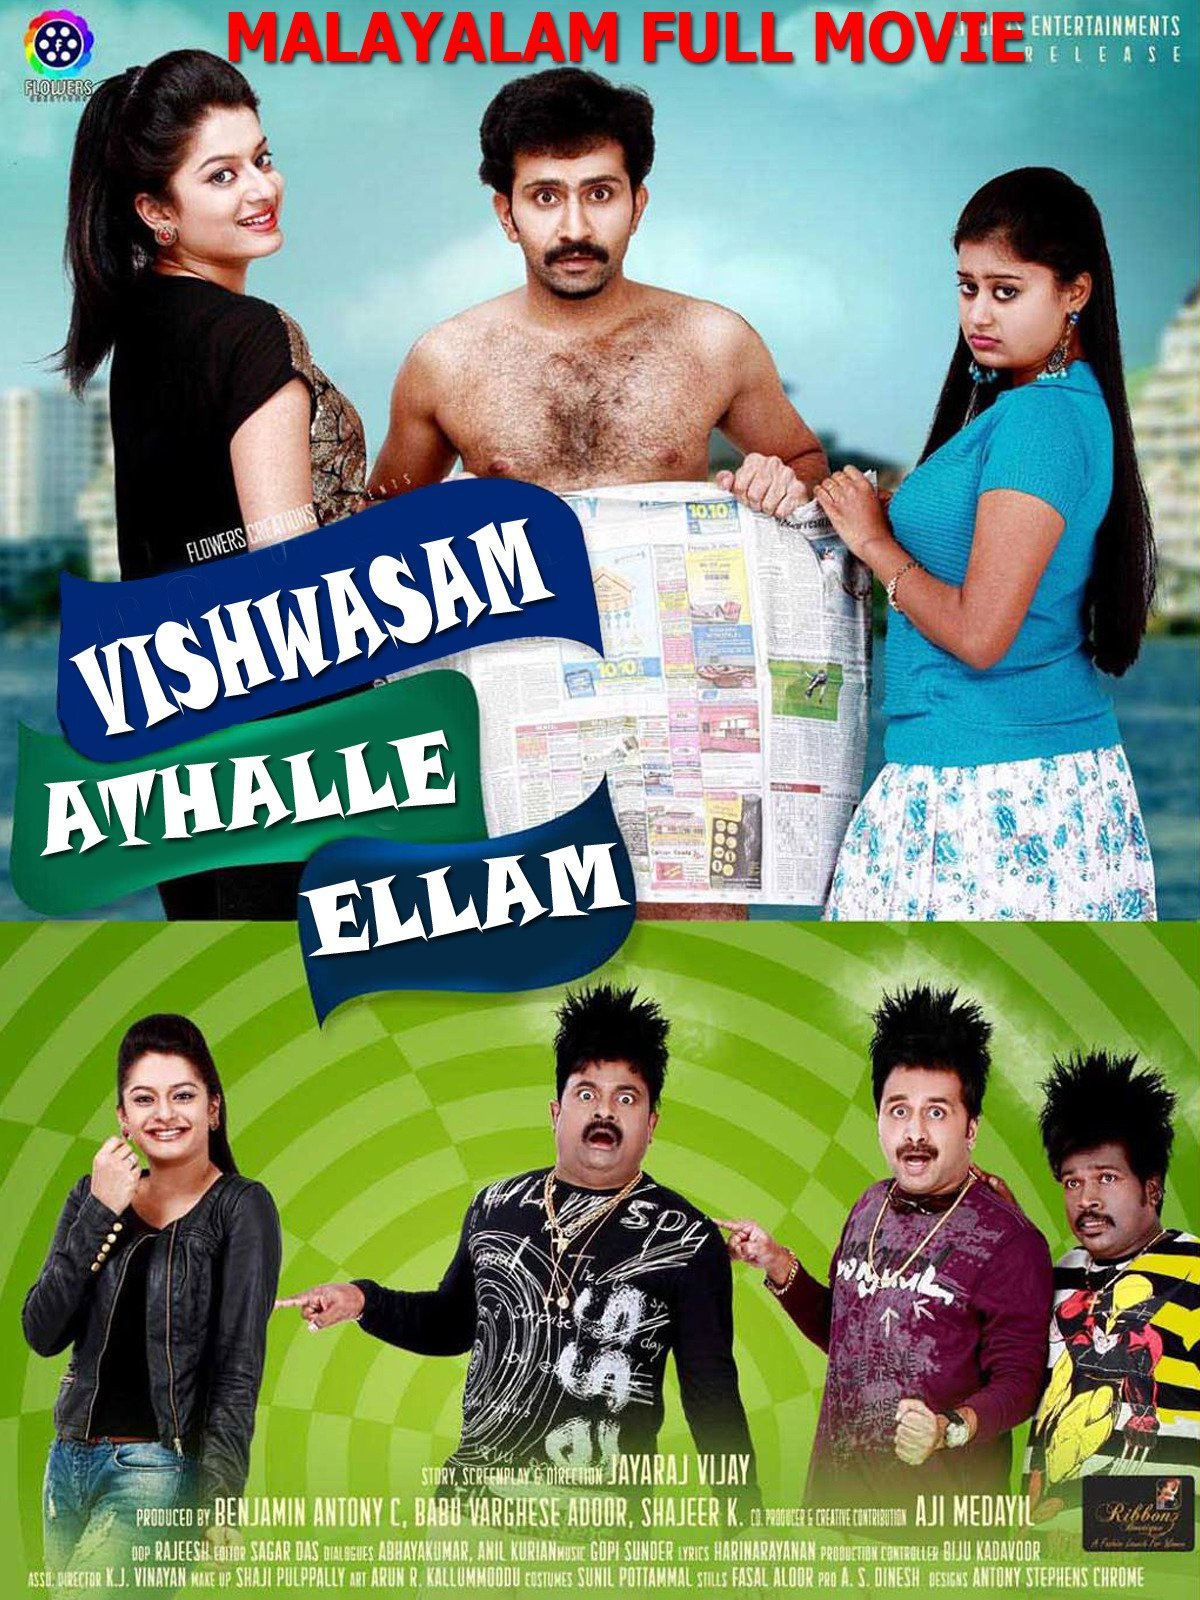 Vishwasam Athallae Ellaam